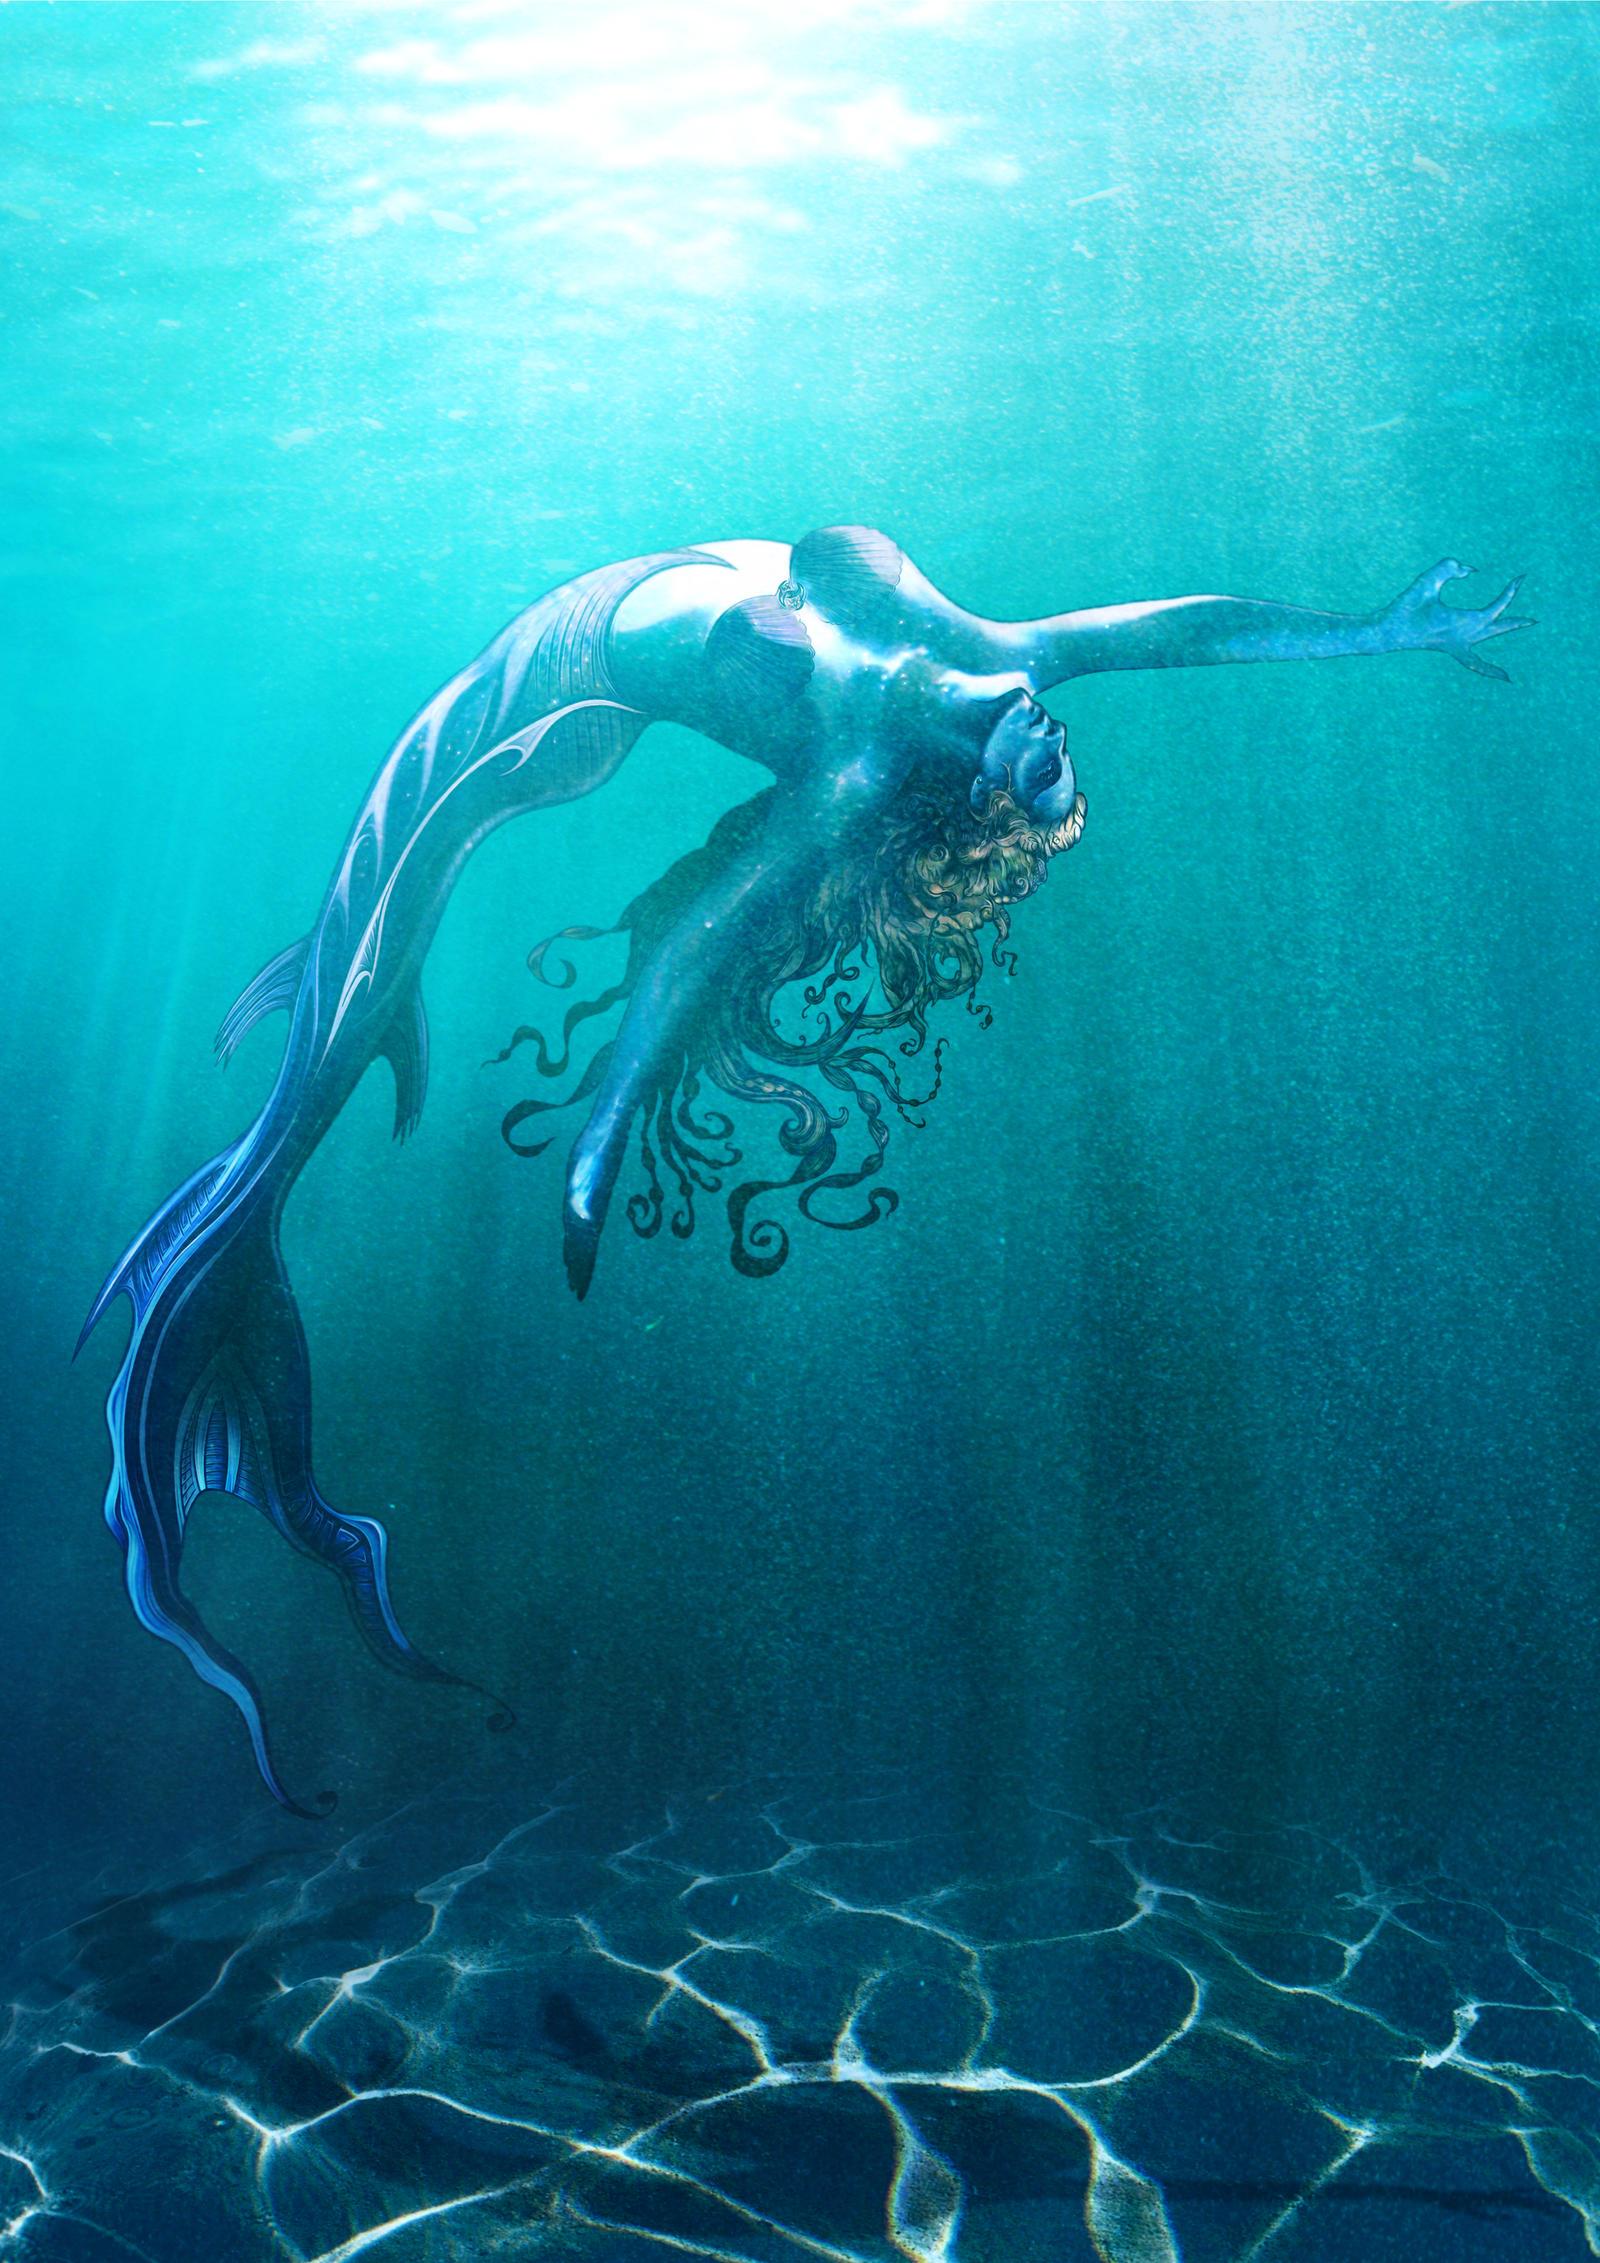 underwater mermaid wallpaper - photo #30